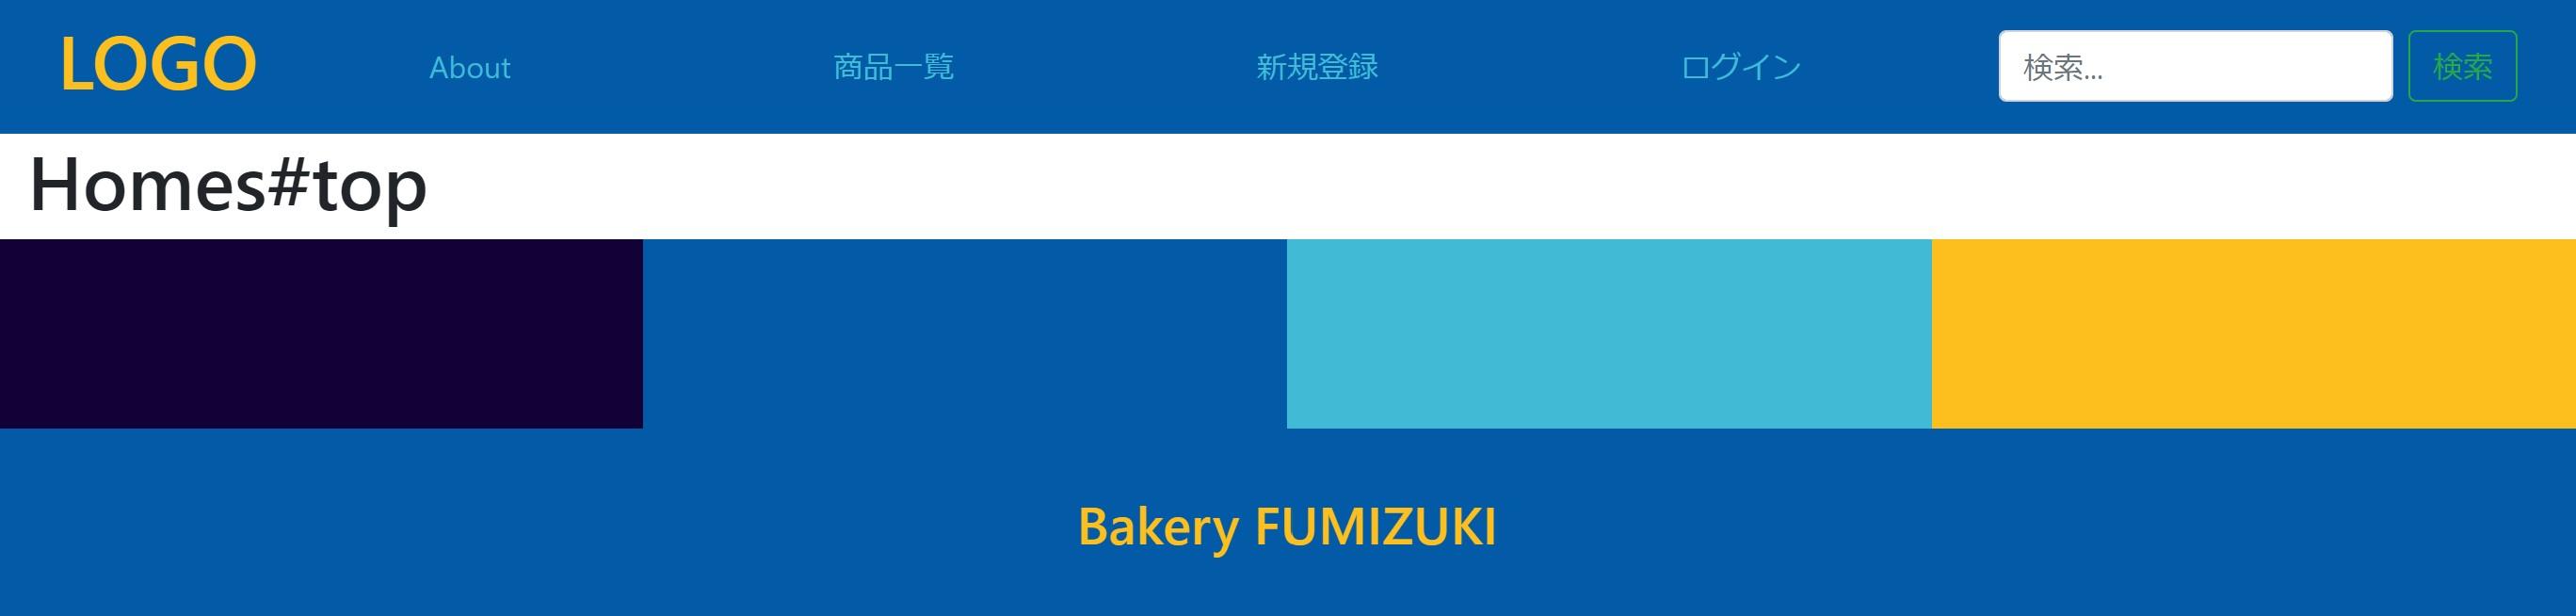 fumizuki_top.jpg